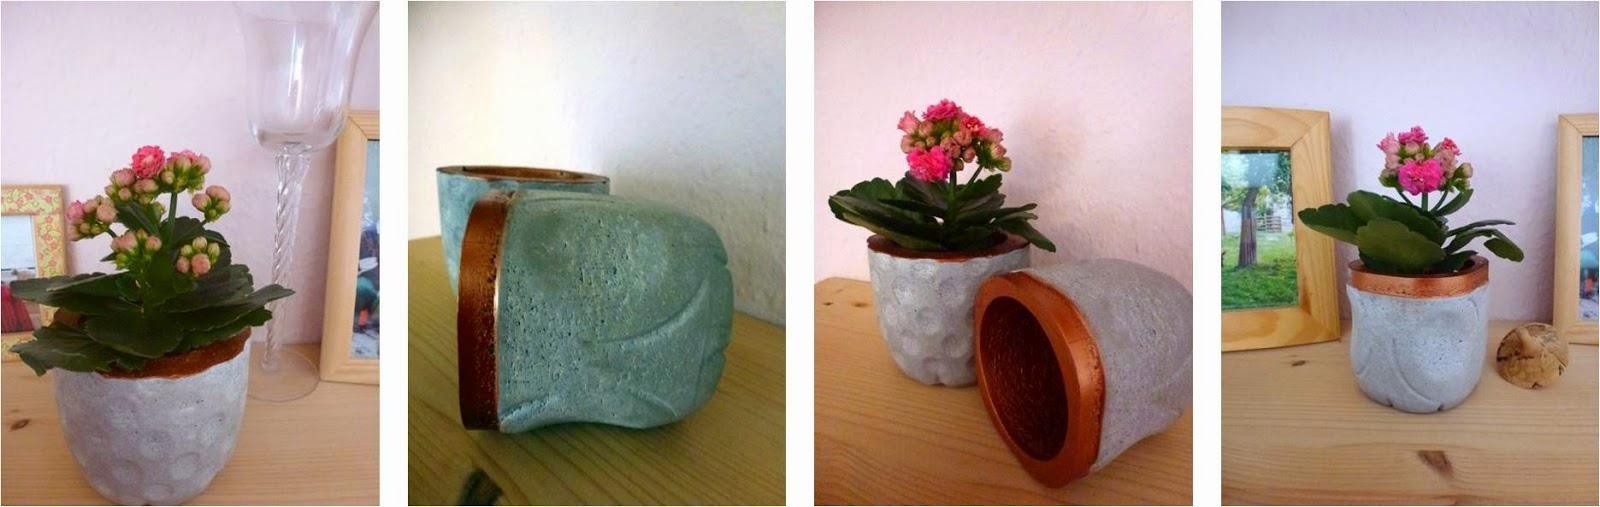 ani 39 s villa kunterbunt beton mit suchtpotential. Black Bedroom Furniture Sets. Home Design Ideas